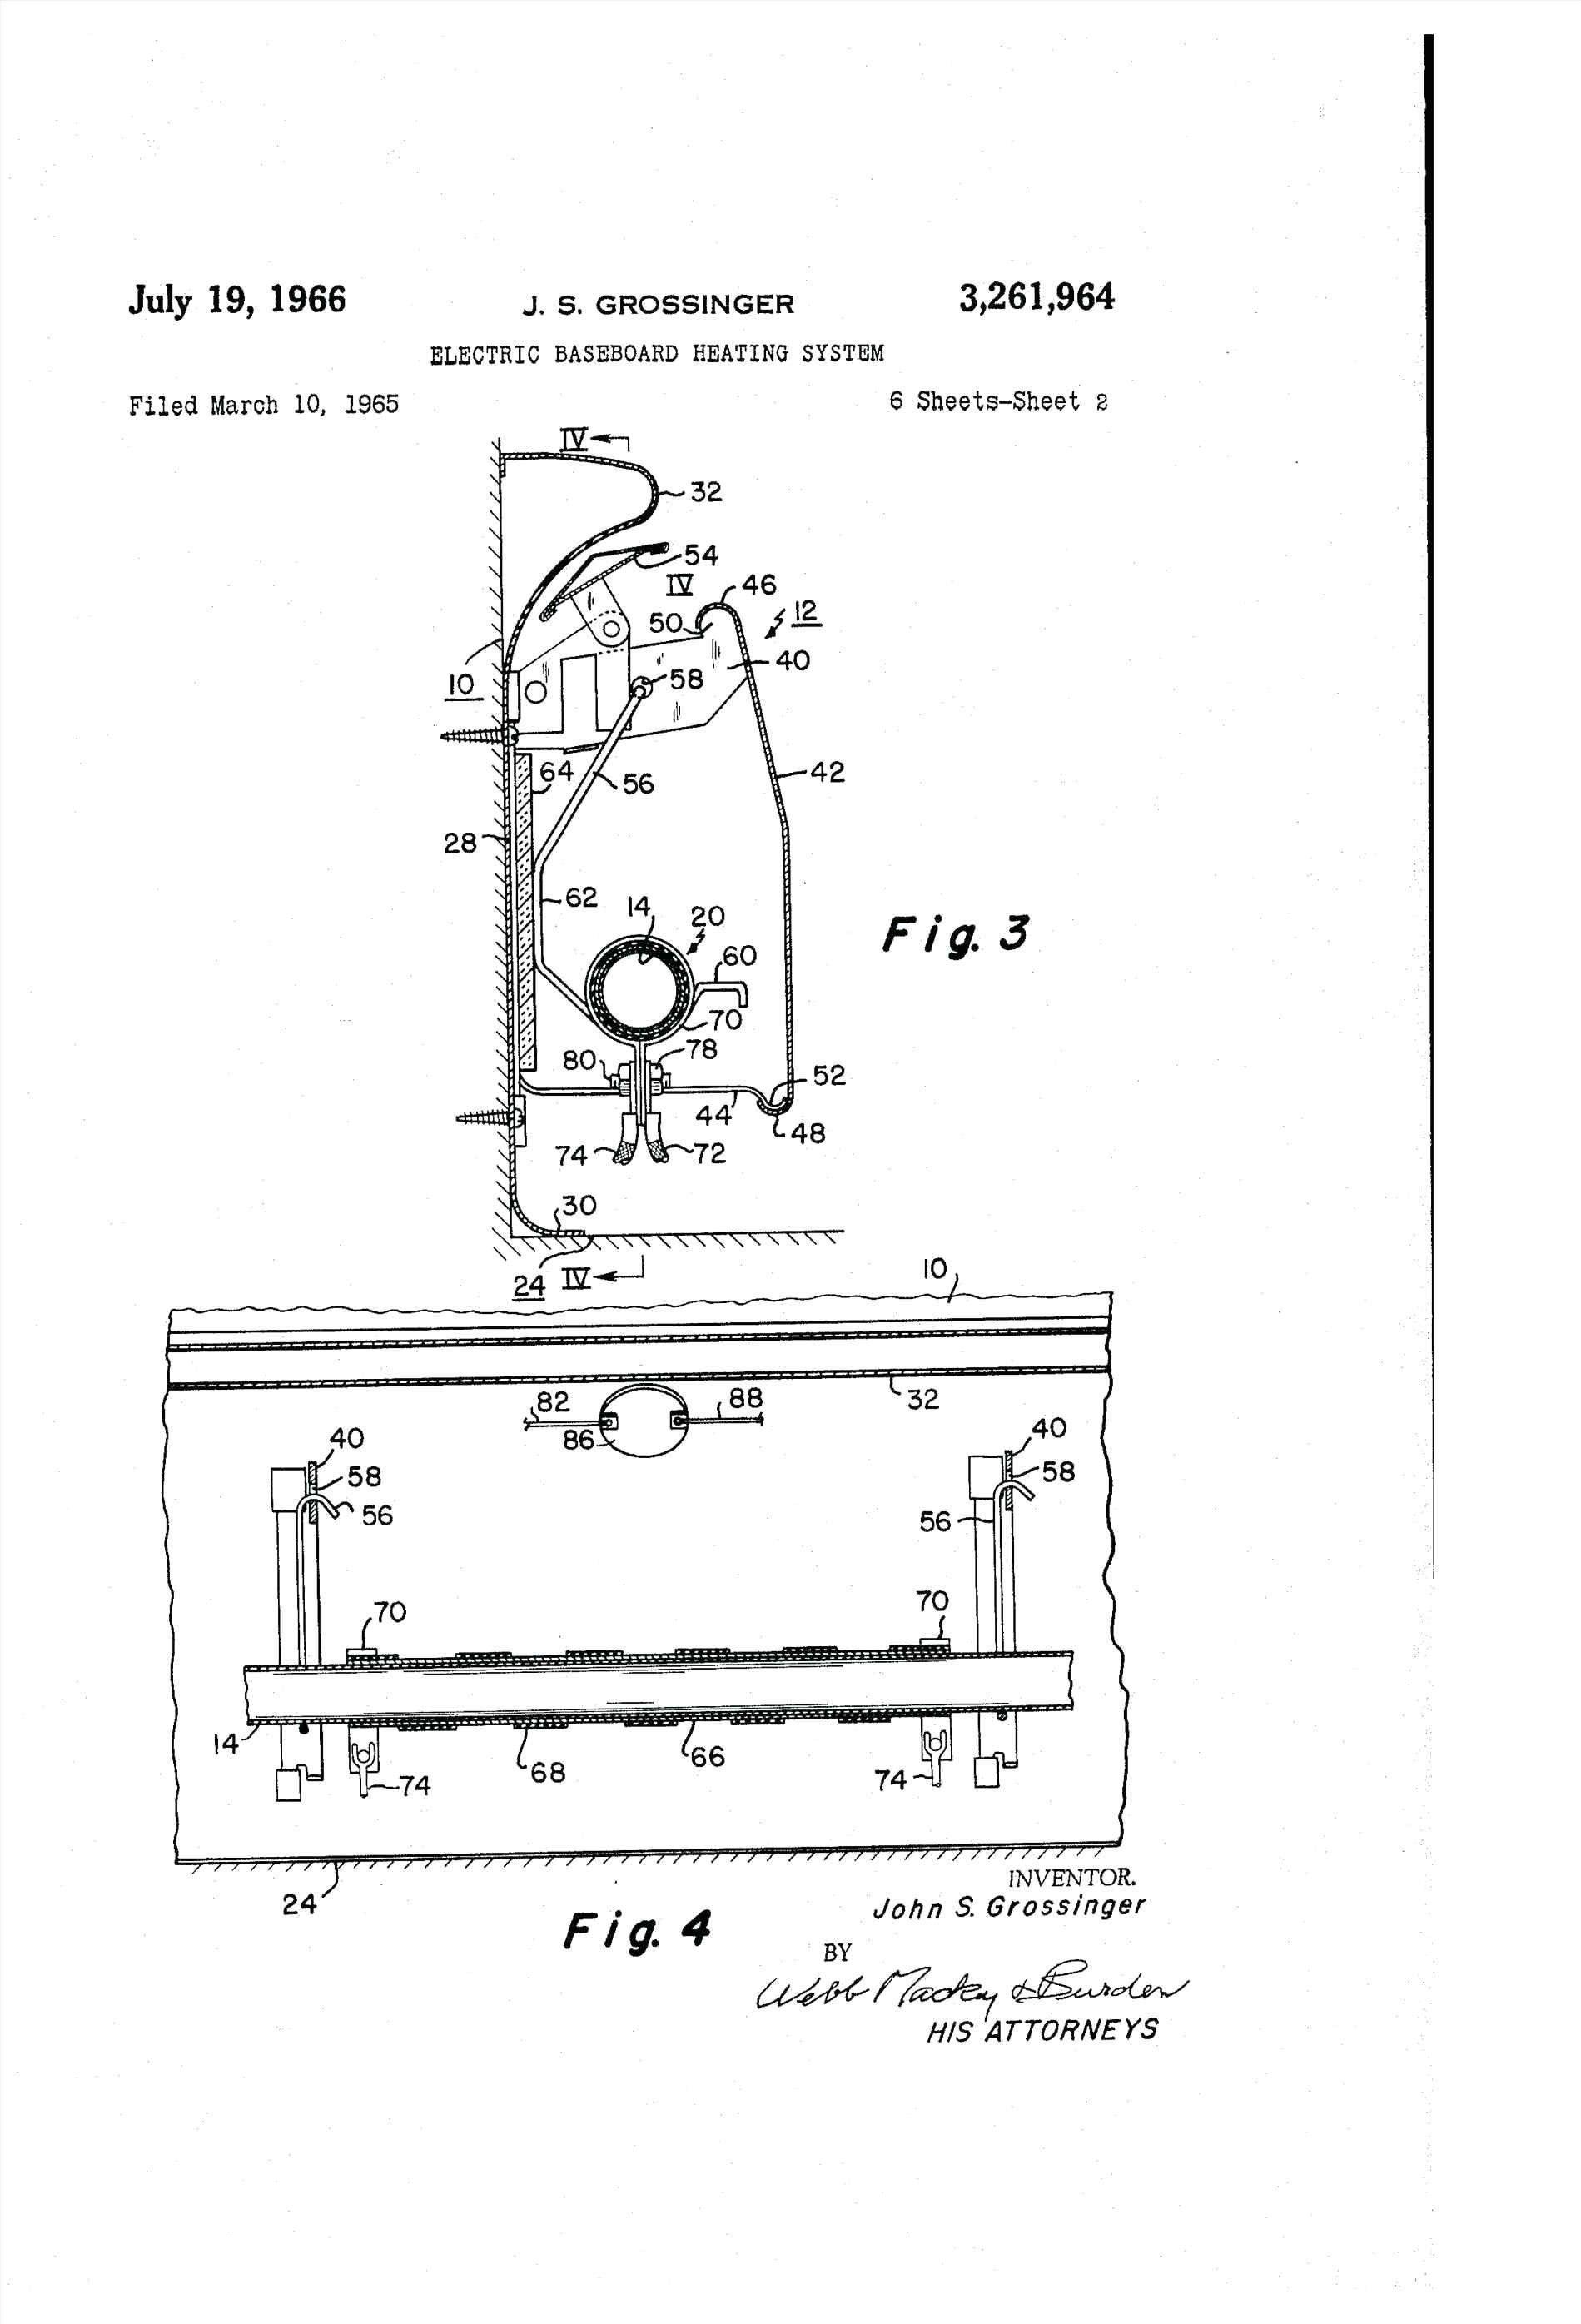 hight resolution of viper alarm 5305v wiring diagram from vehicle alarm system diagramviper alarm v wiring diagram from on